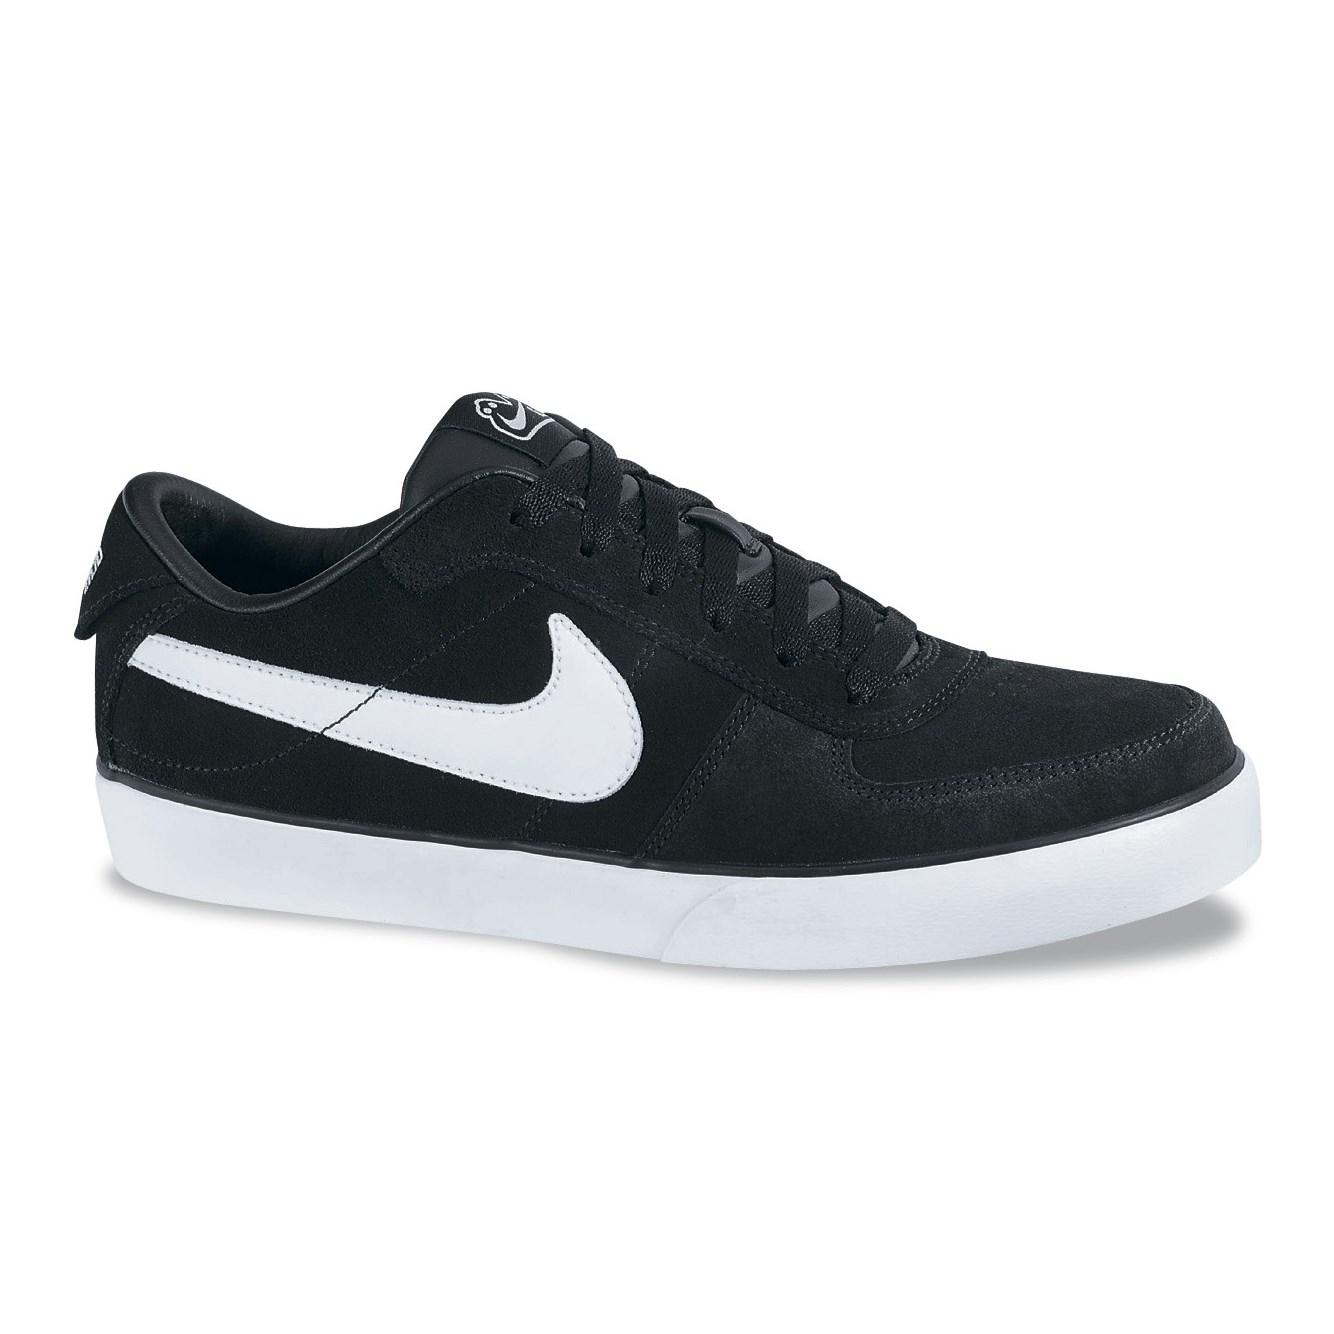 Cheap Nike 6.0 Mavrk